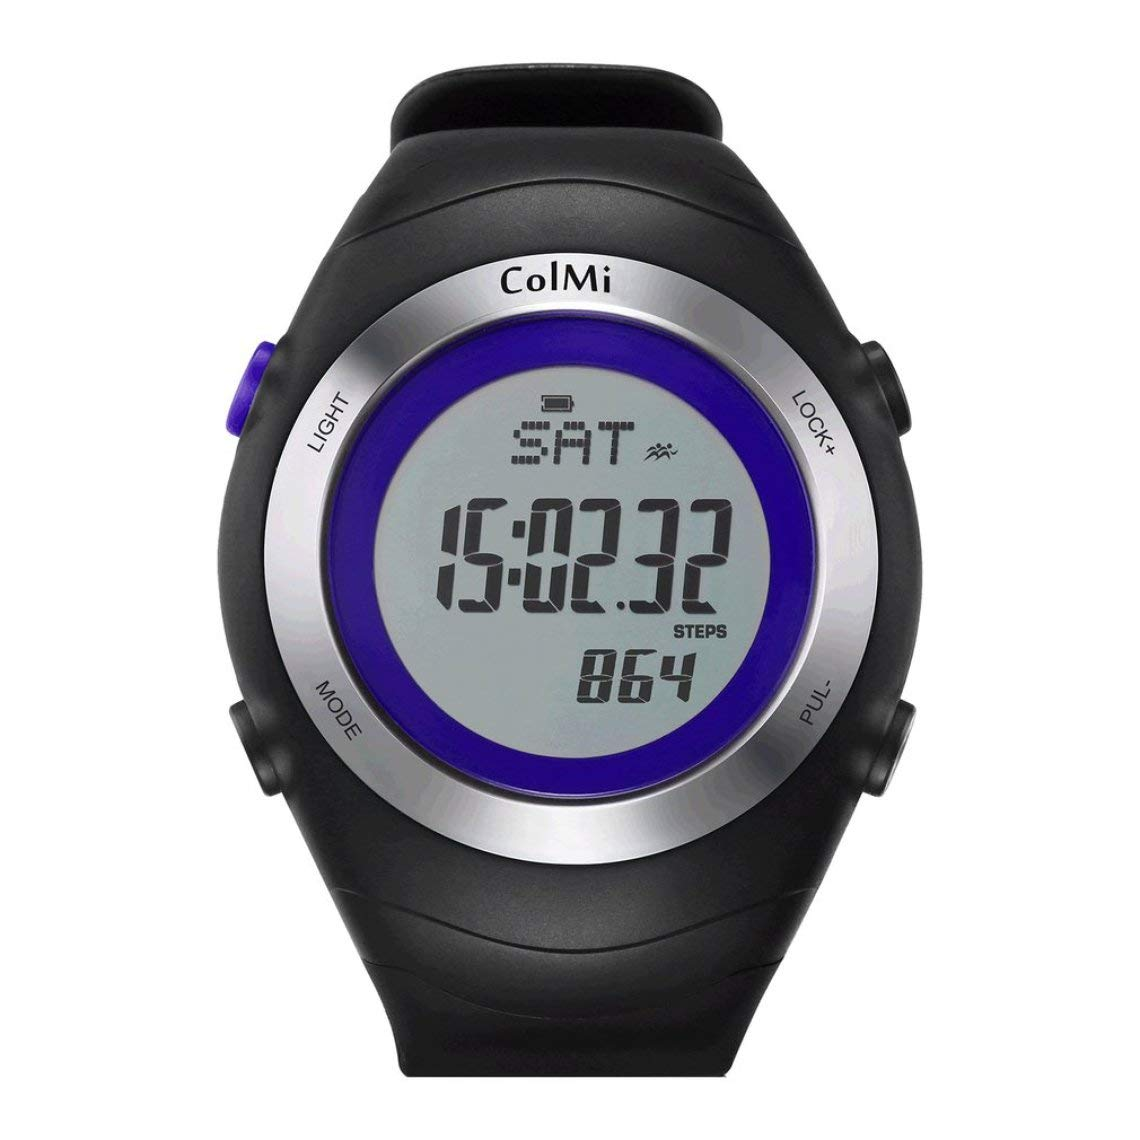 Zinniaya ColMi Fast Running Sports Smart Watch 5ATM IP68 ...